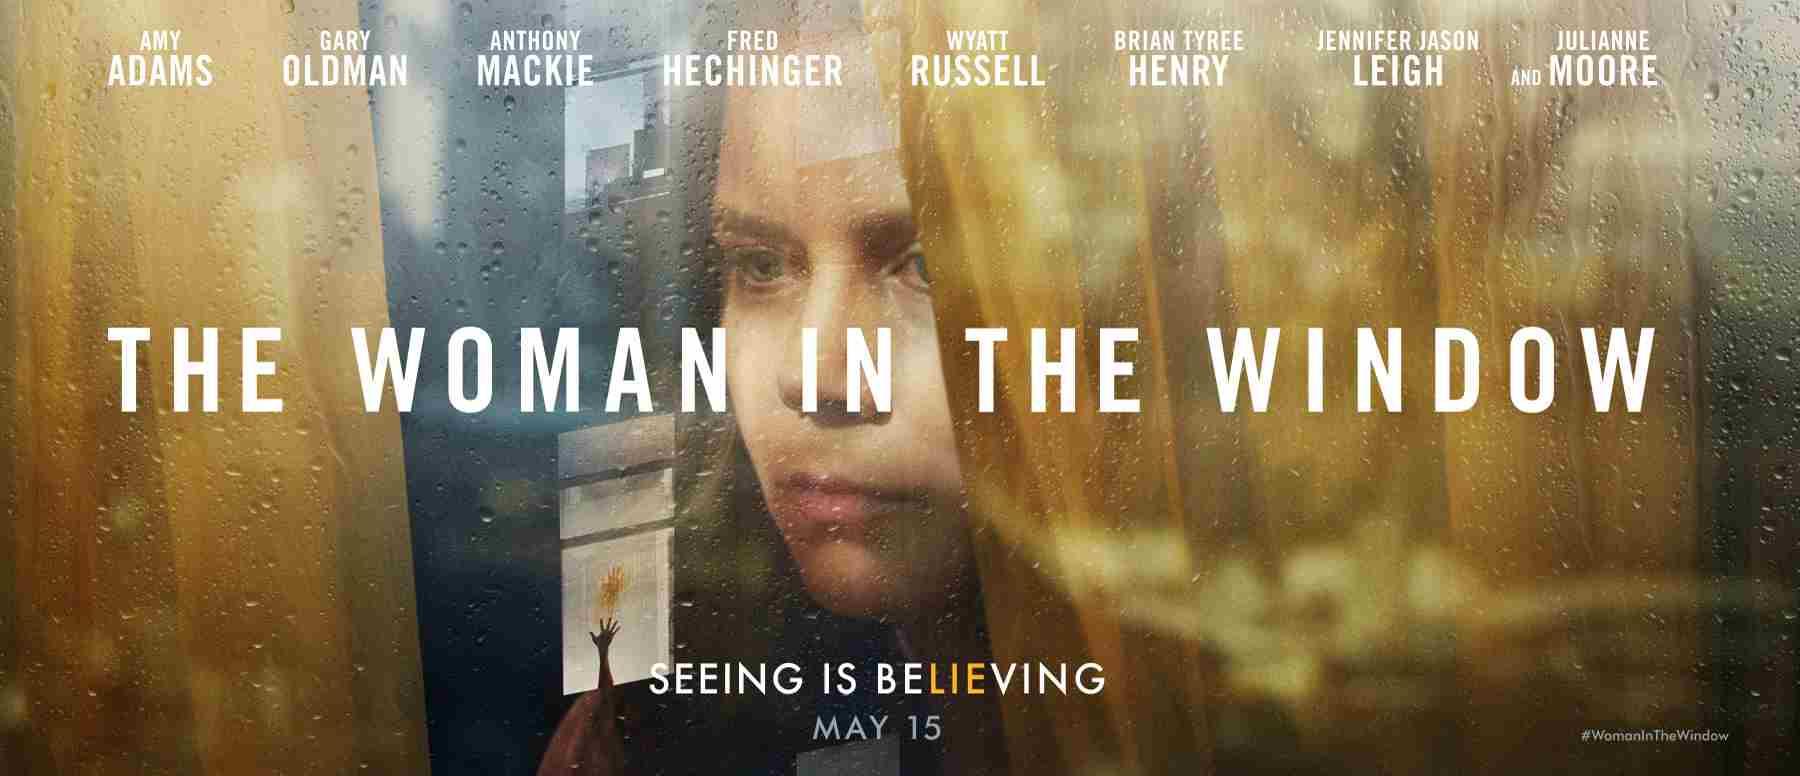 The Woman in The Window filme din 2020